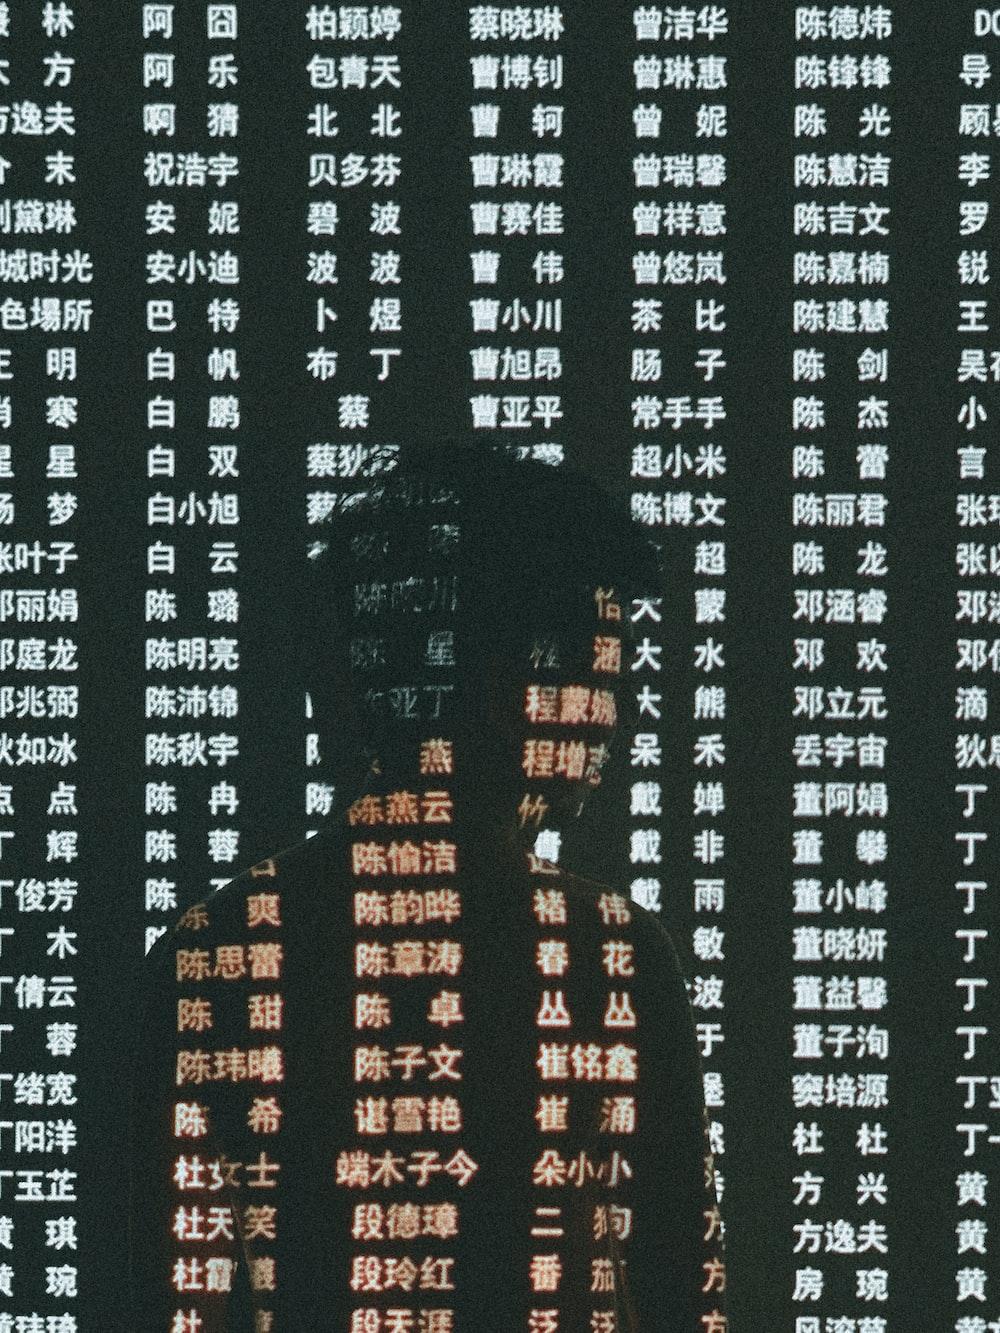 white text overlay on black background